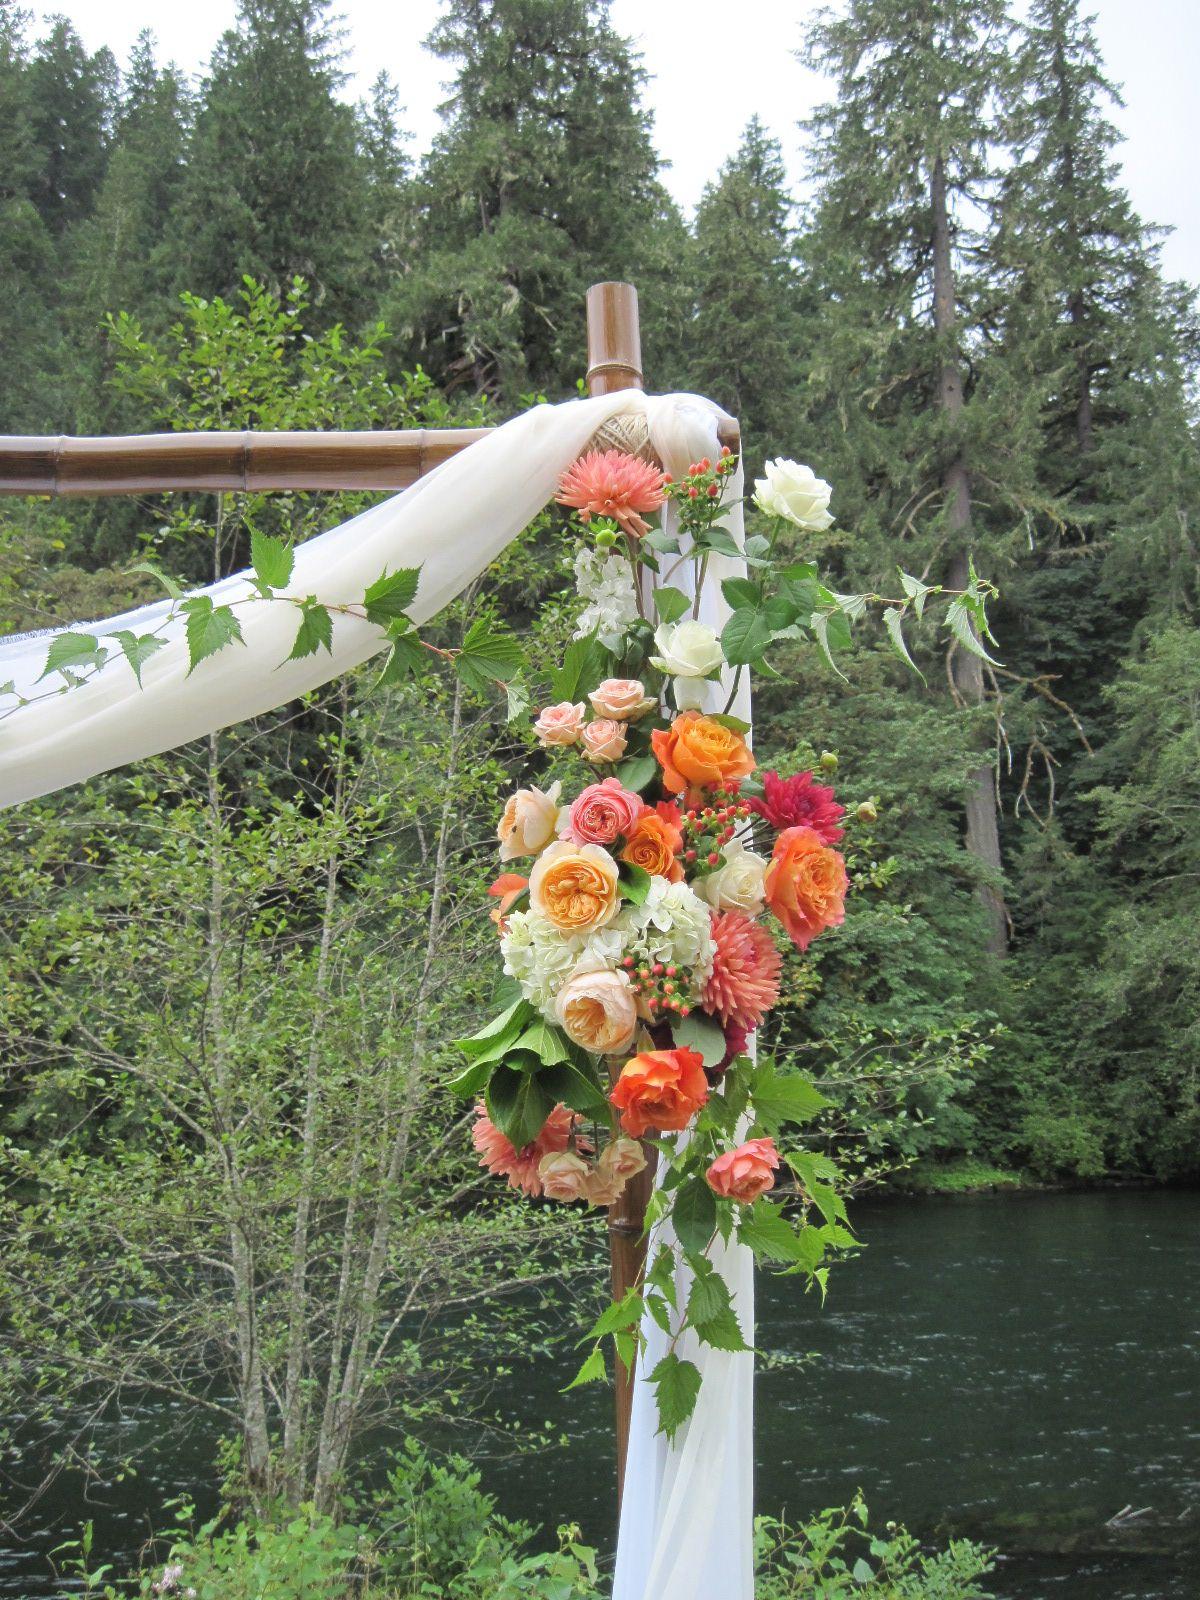 Pop Of Color By The River Lovely Altar Piece By Passionflower Design In Eugene Color Pop Floral Design Design